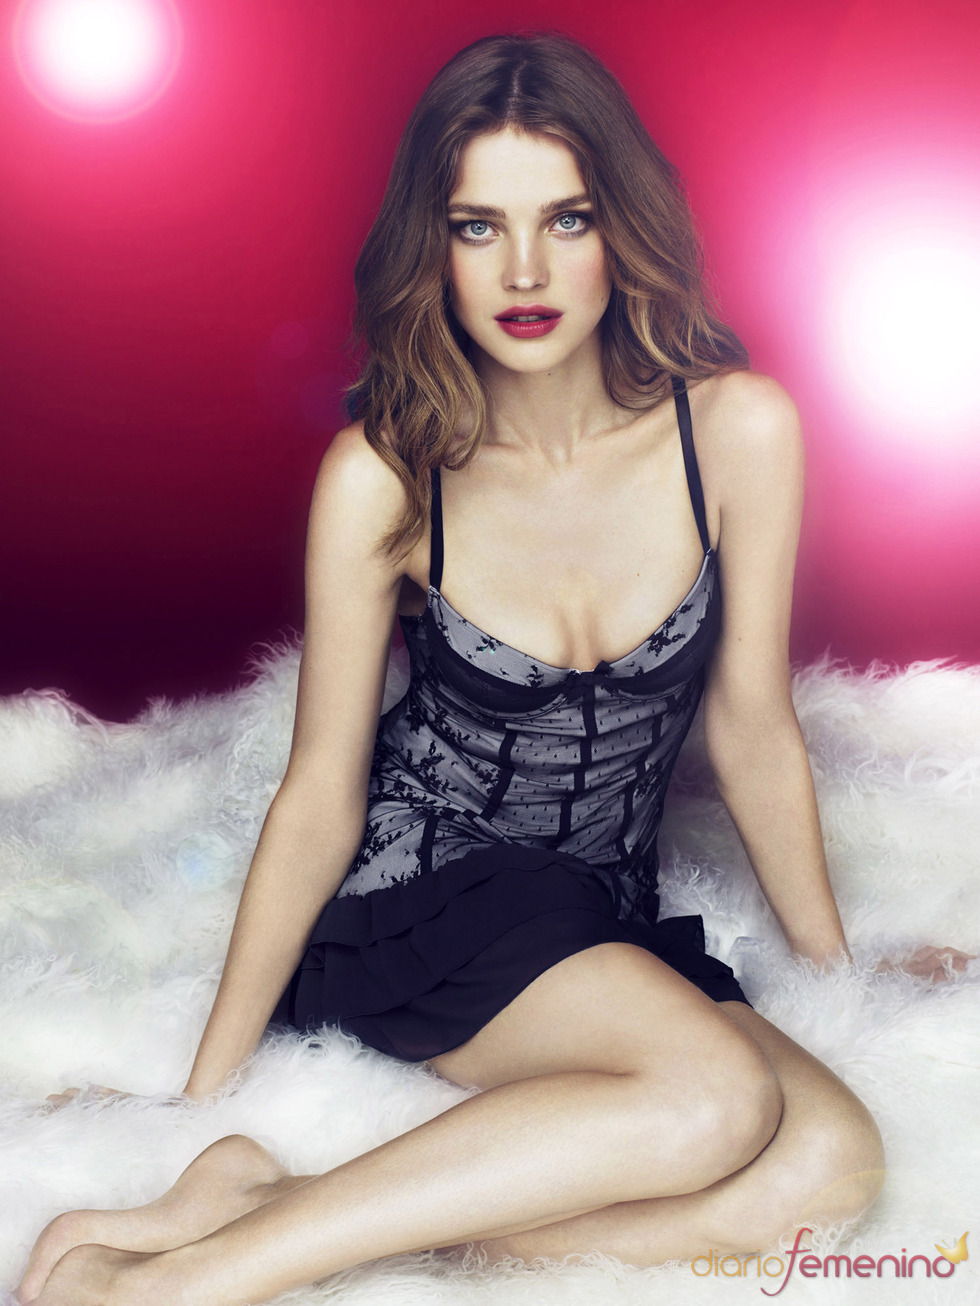 Catálogo de Etam para la Navidad: modelo Beauty